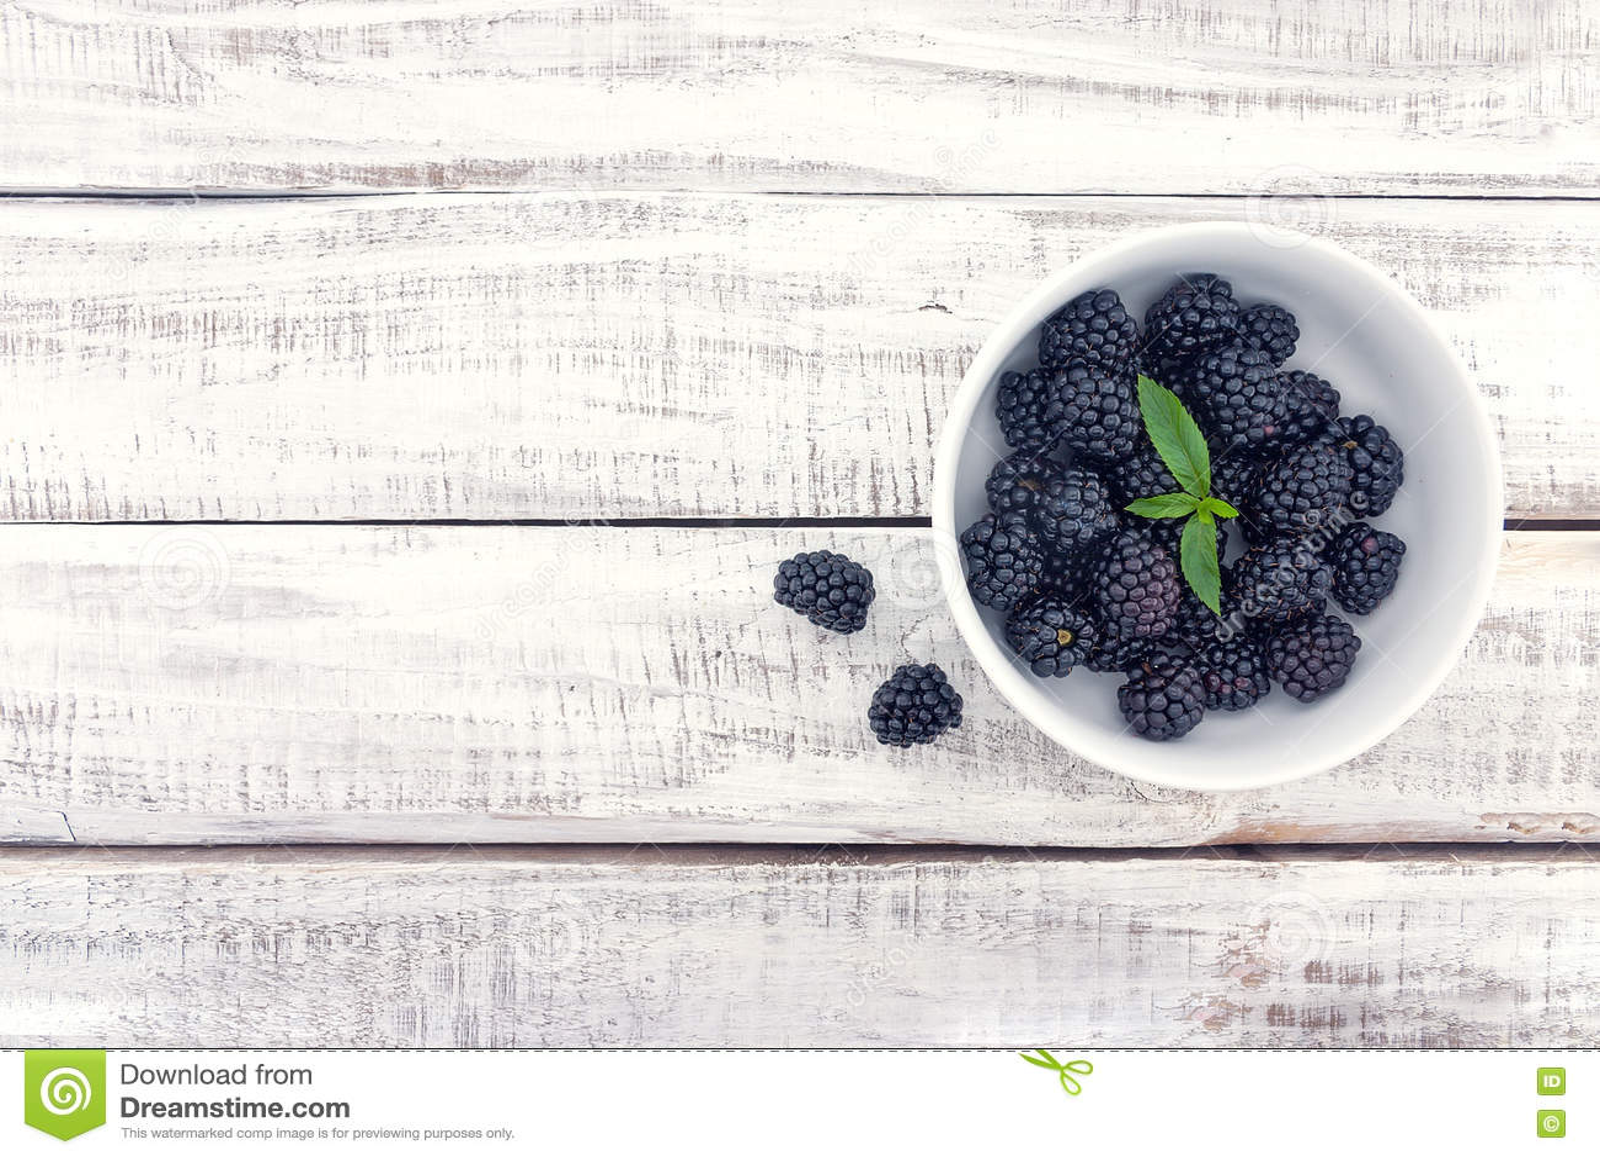 Close up of ripe blackberries in a white ceramic bowl over rusti